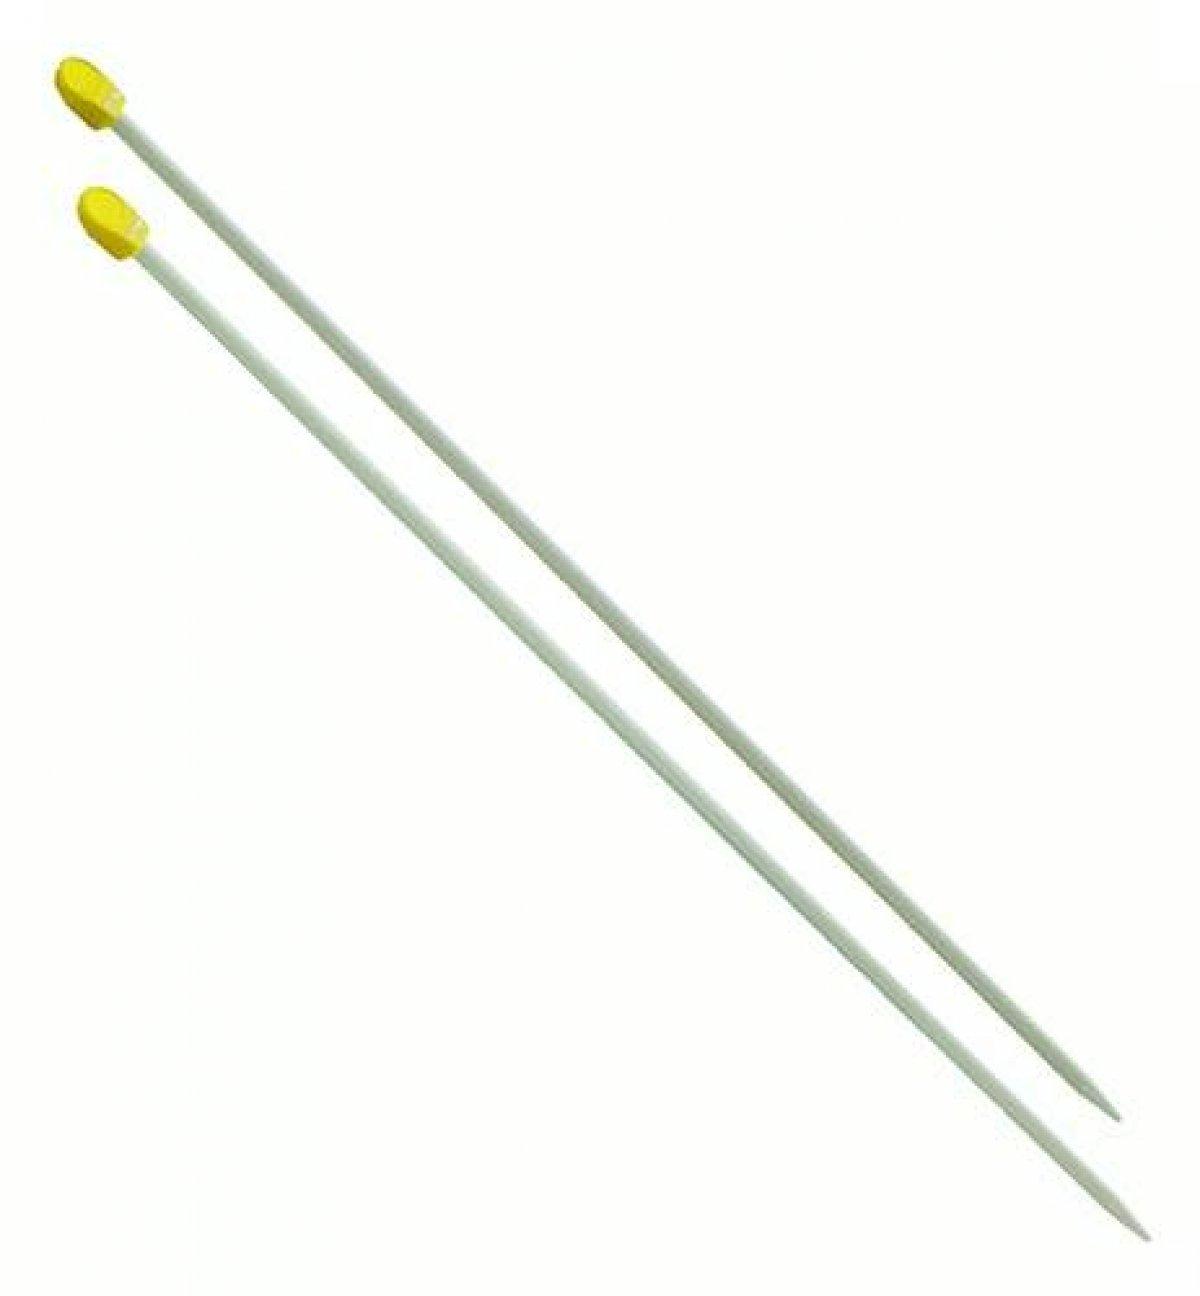 Aluminium Knitting Needle 3.5mm, 40cm Long Prym